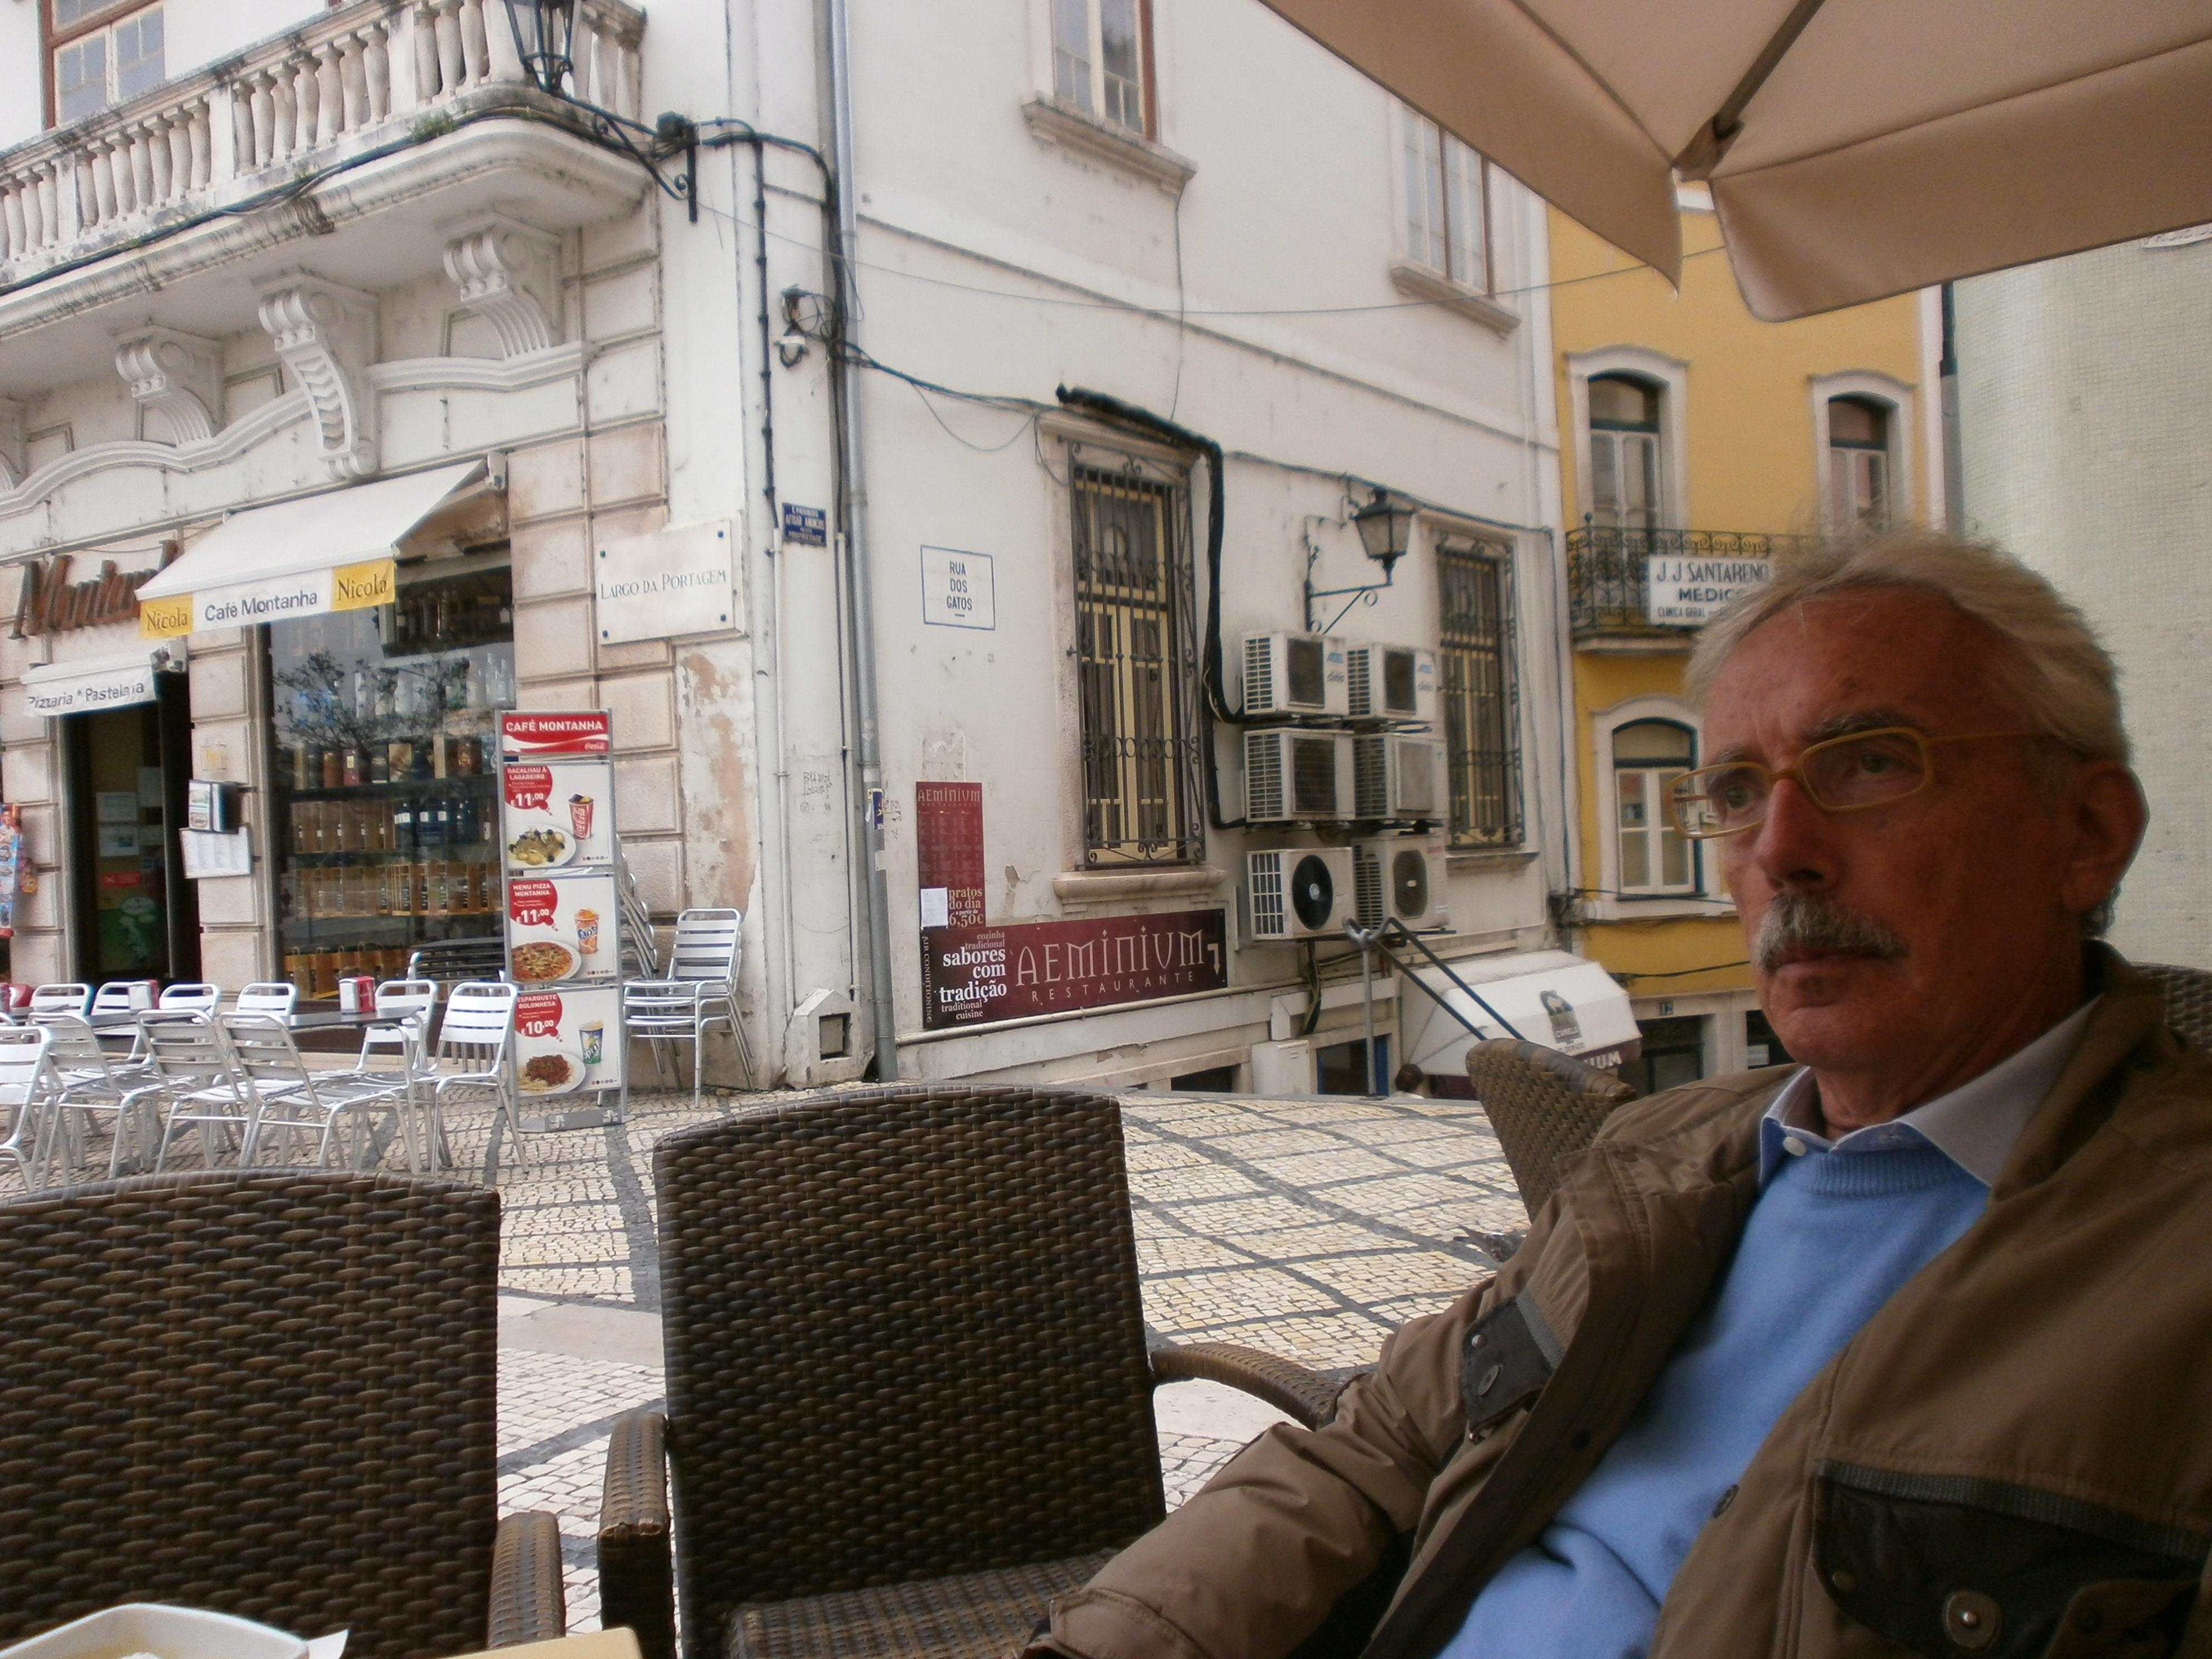 foto 03 Coimbra 2014 P